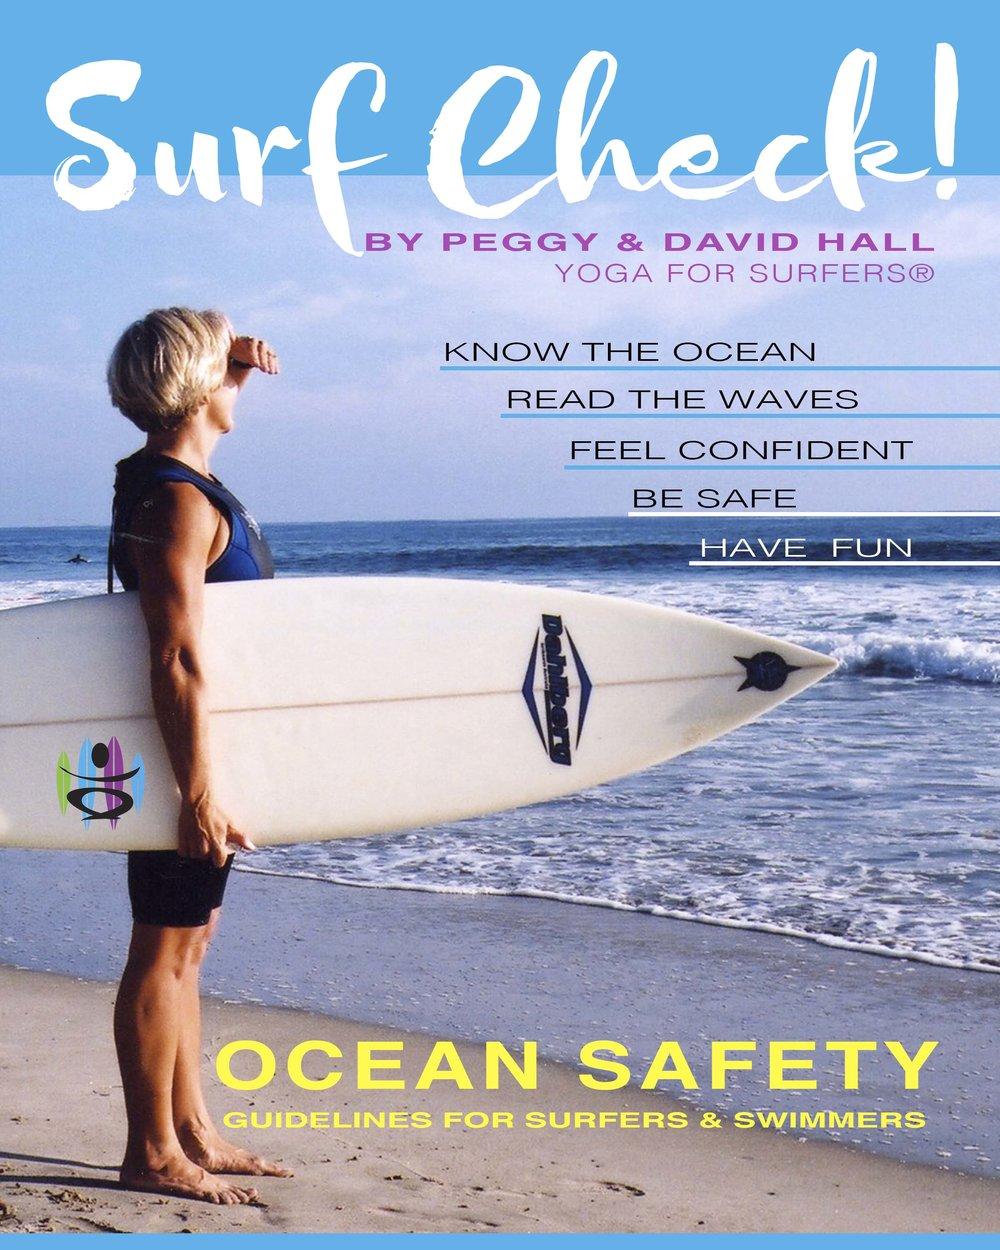 Ocean Safety Ebook Cover_light blue-2.jpg